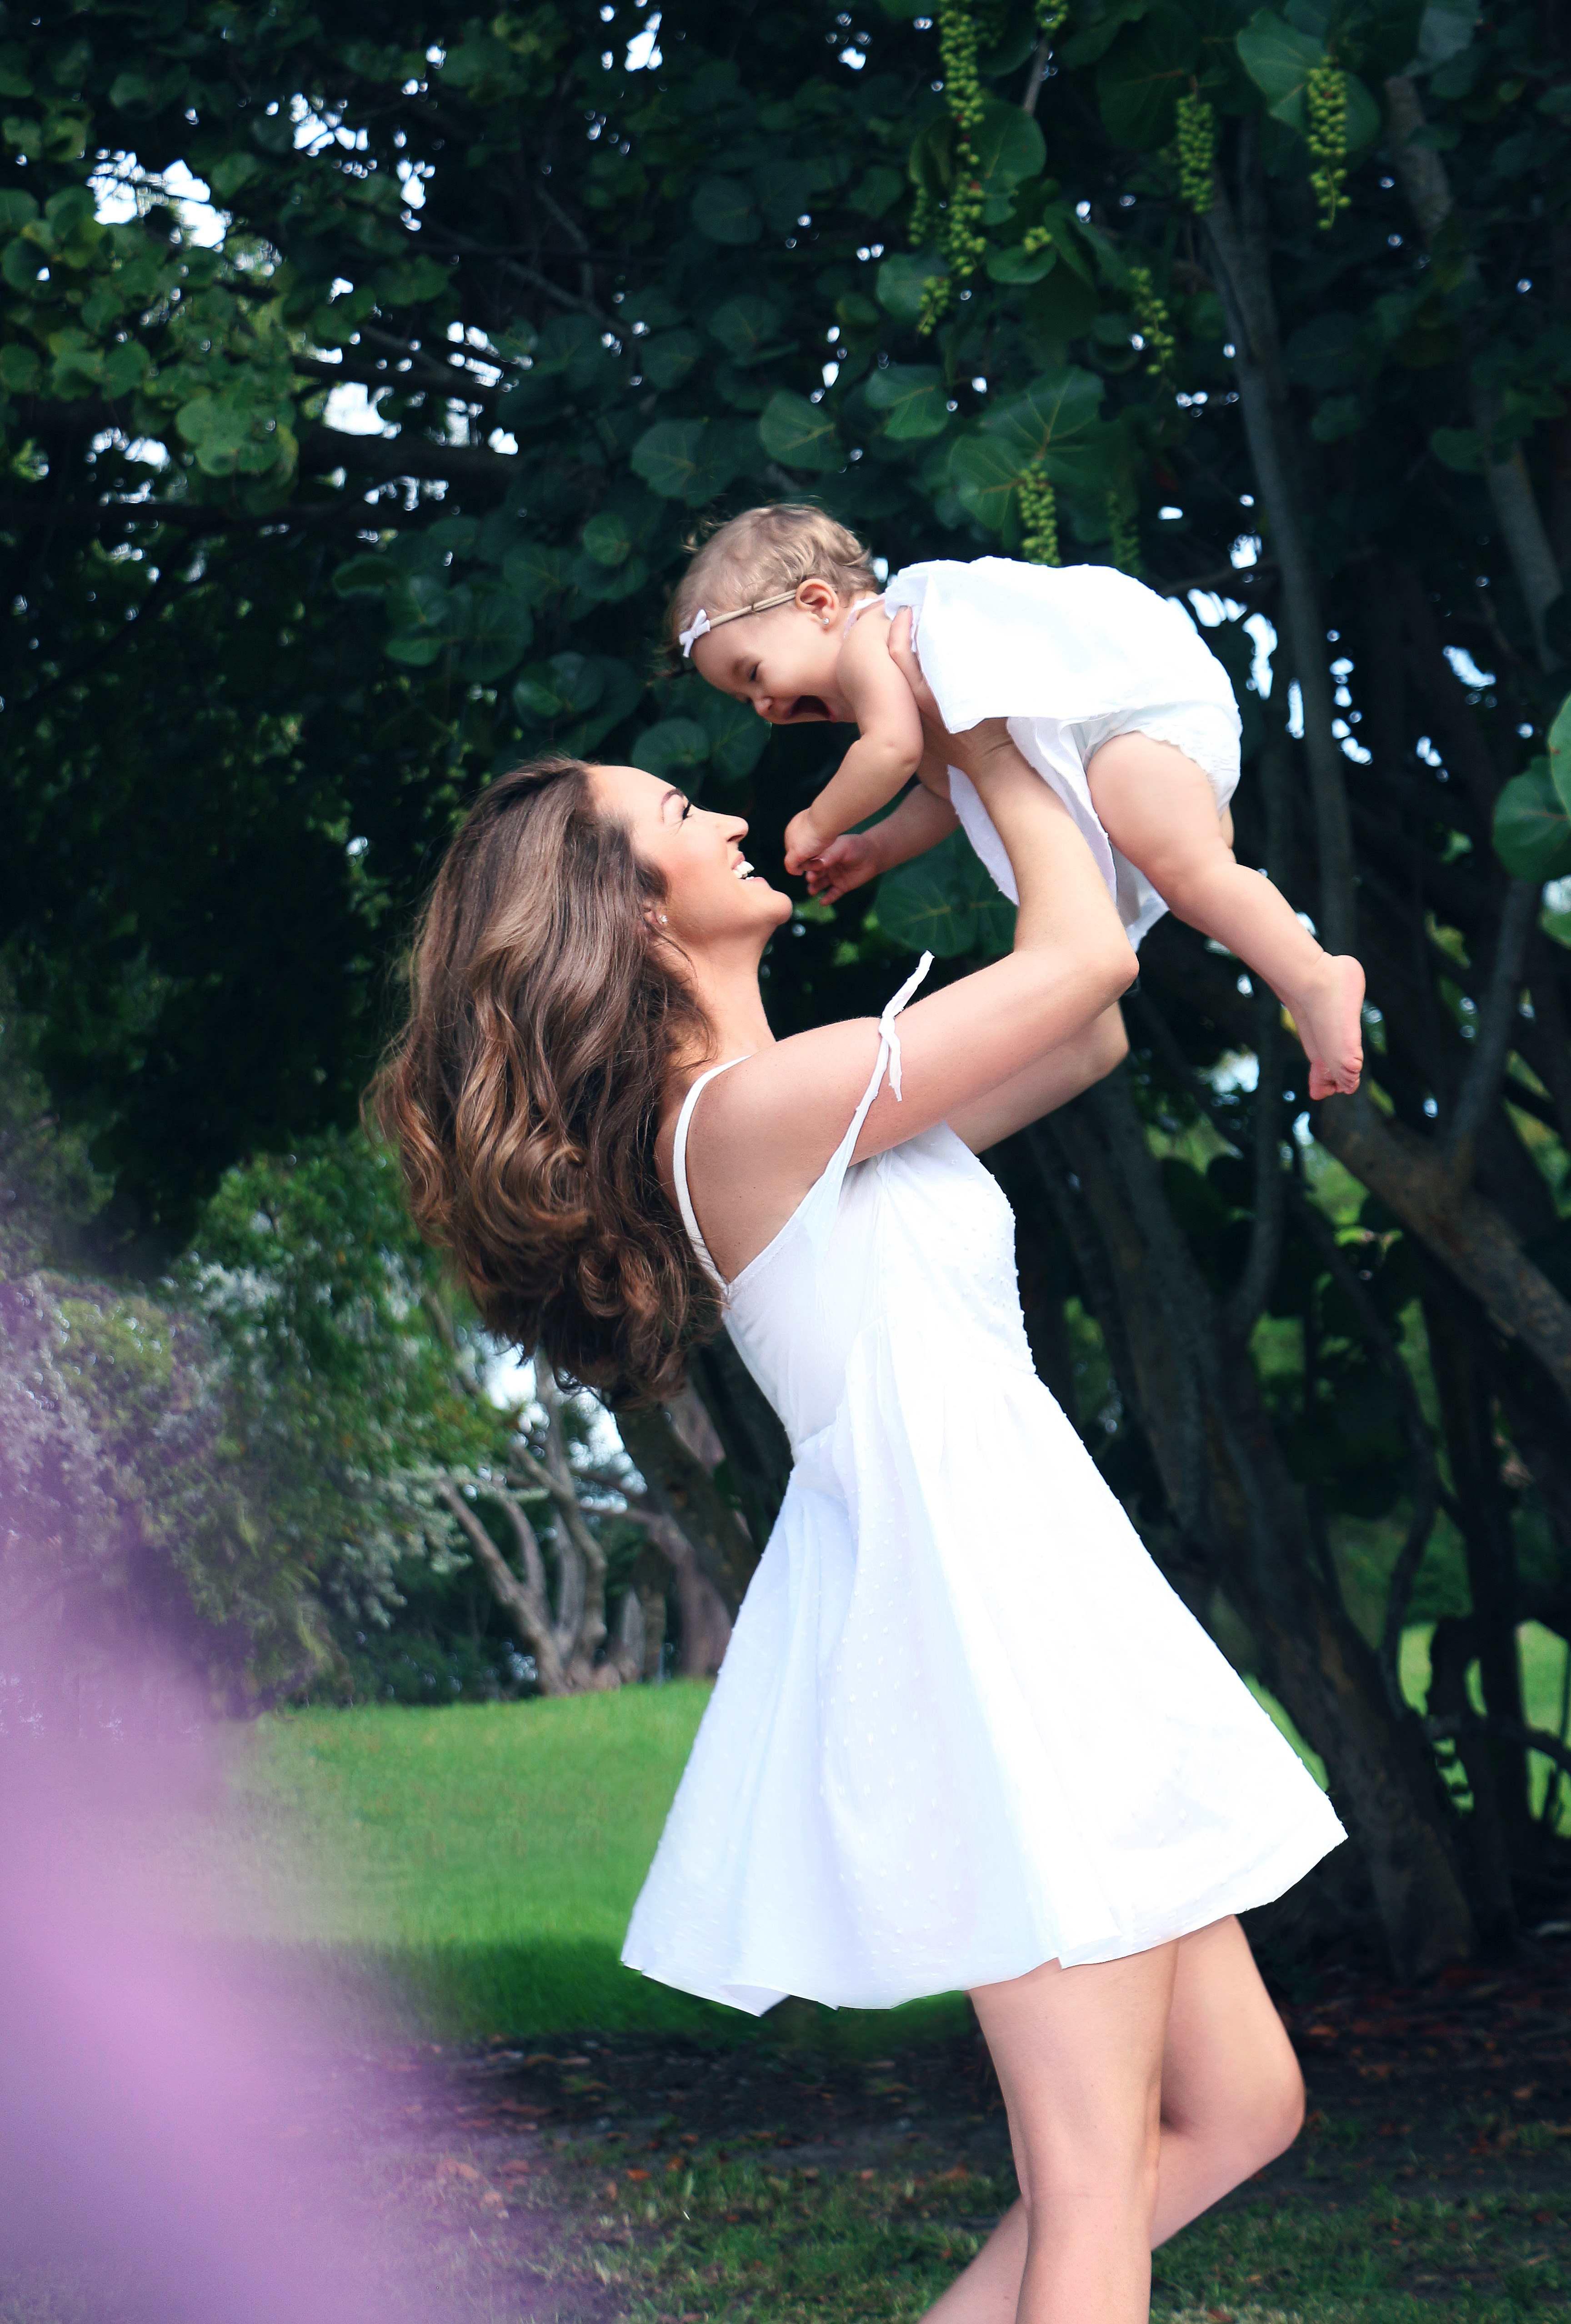 – 9 a mom and me photographer family portrait katherine eastman photography miami south florida birthday fairytale chagrin falls tea party